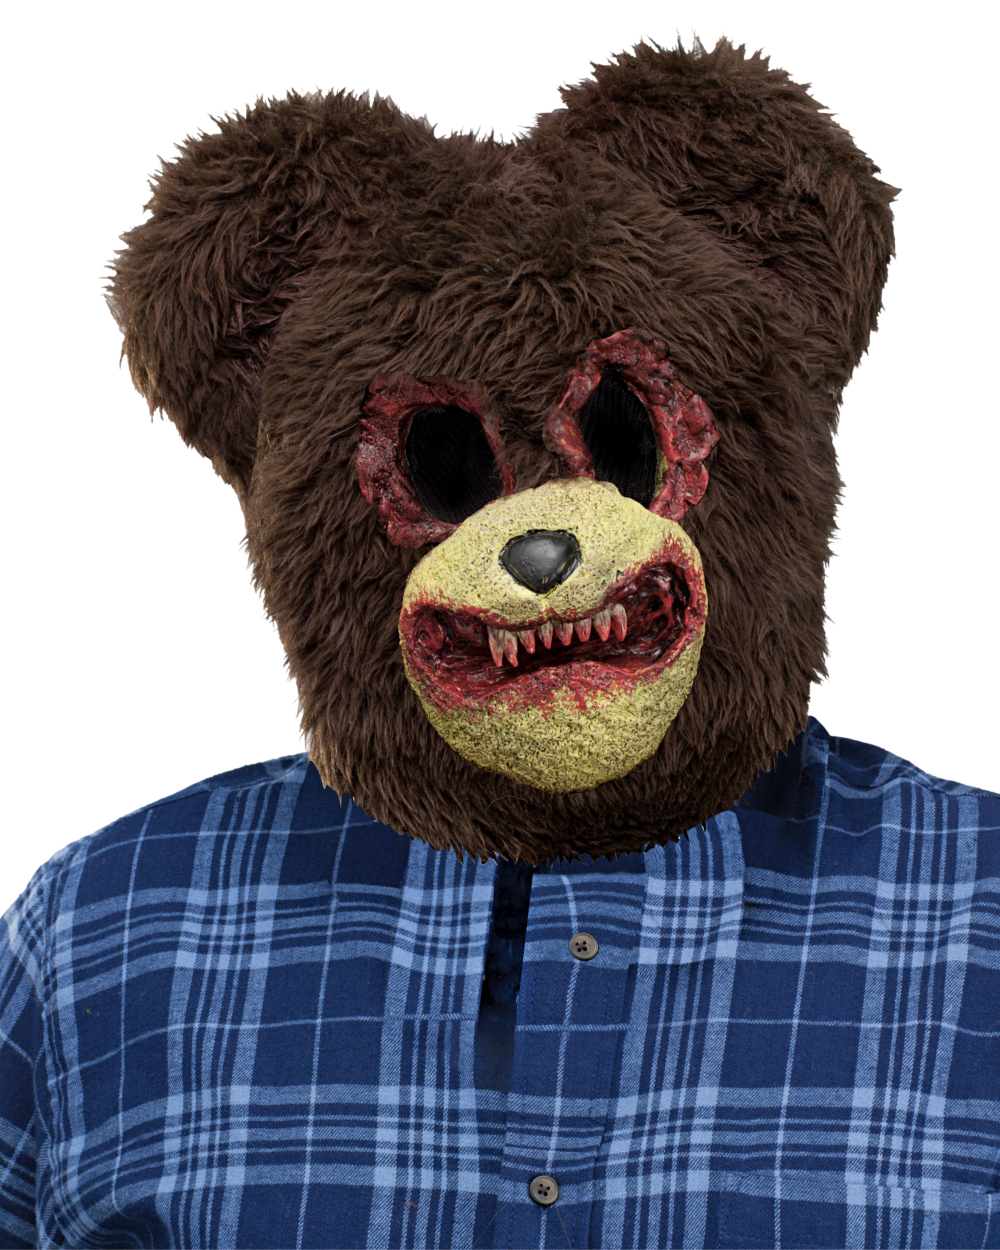 Scary Animal Halloween Masks.Scary Bear Animal Halloween Costume Mask Walmart Com Walmart Com